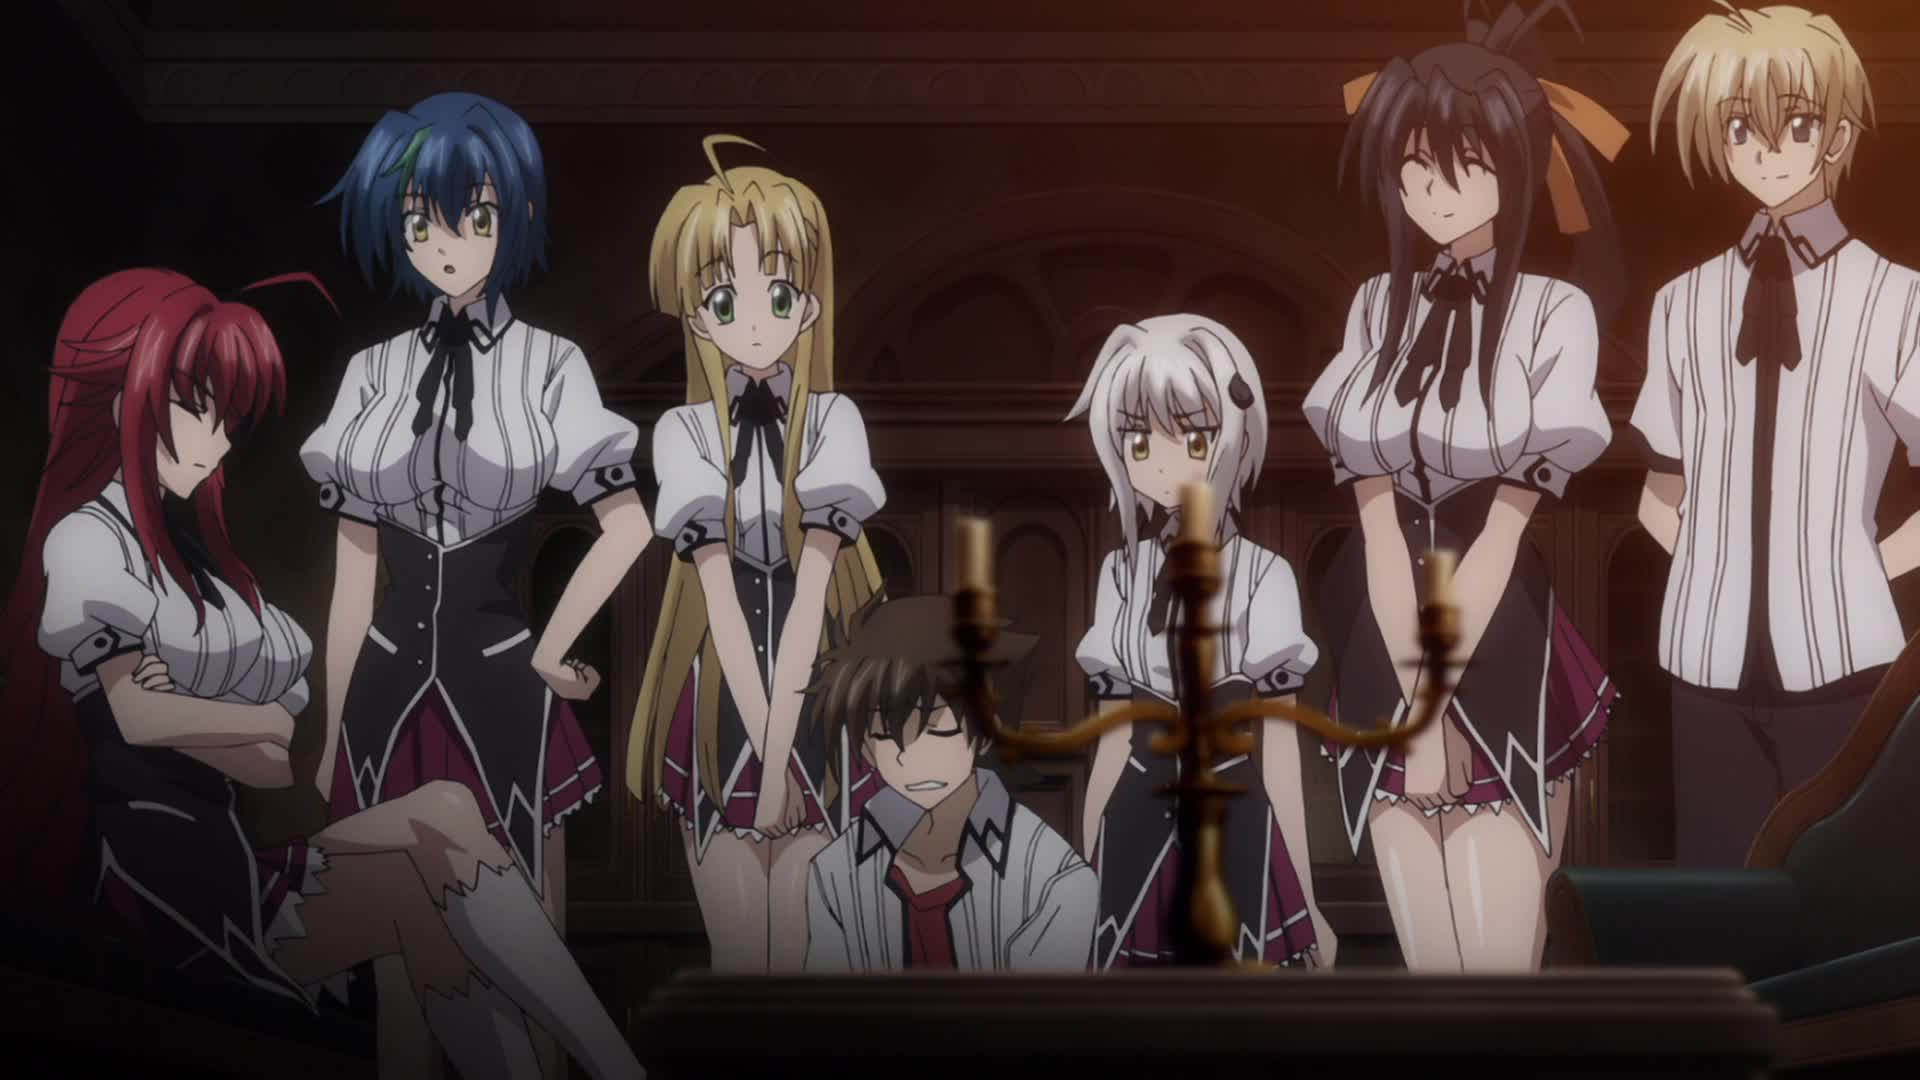 High School DxD New: Gekkou Koutei no Excalibur - Episode 9